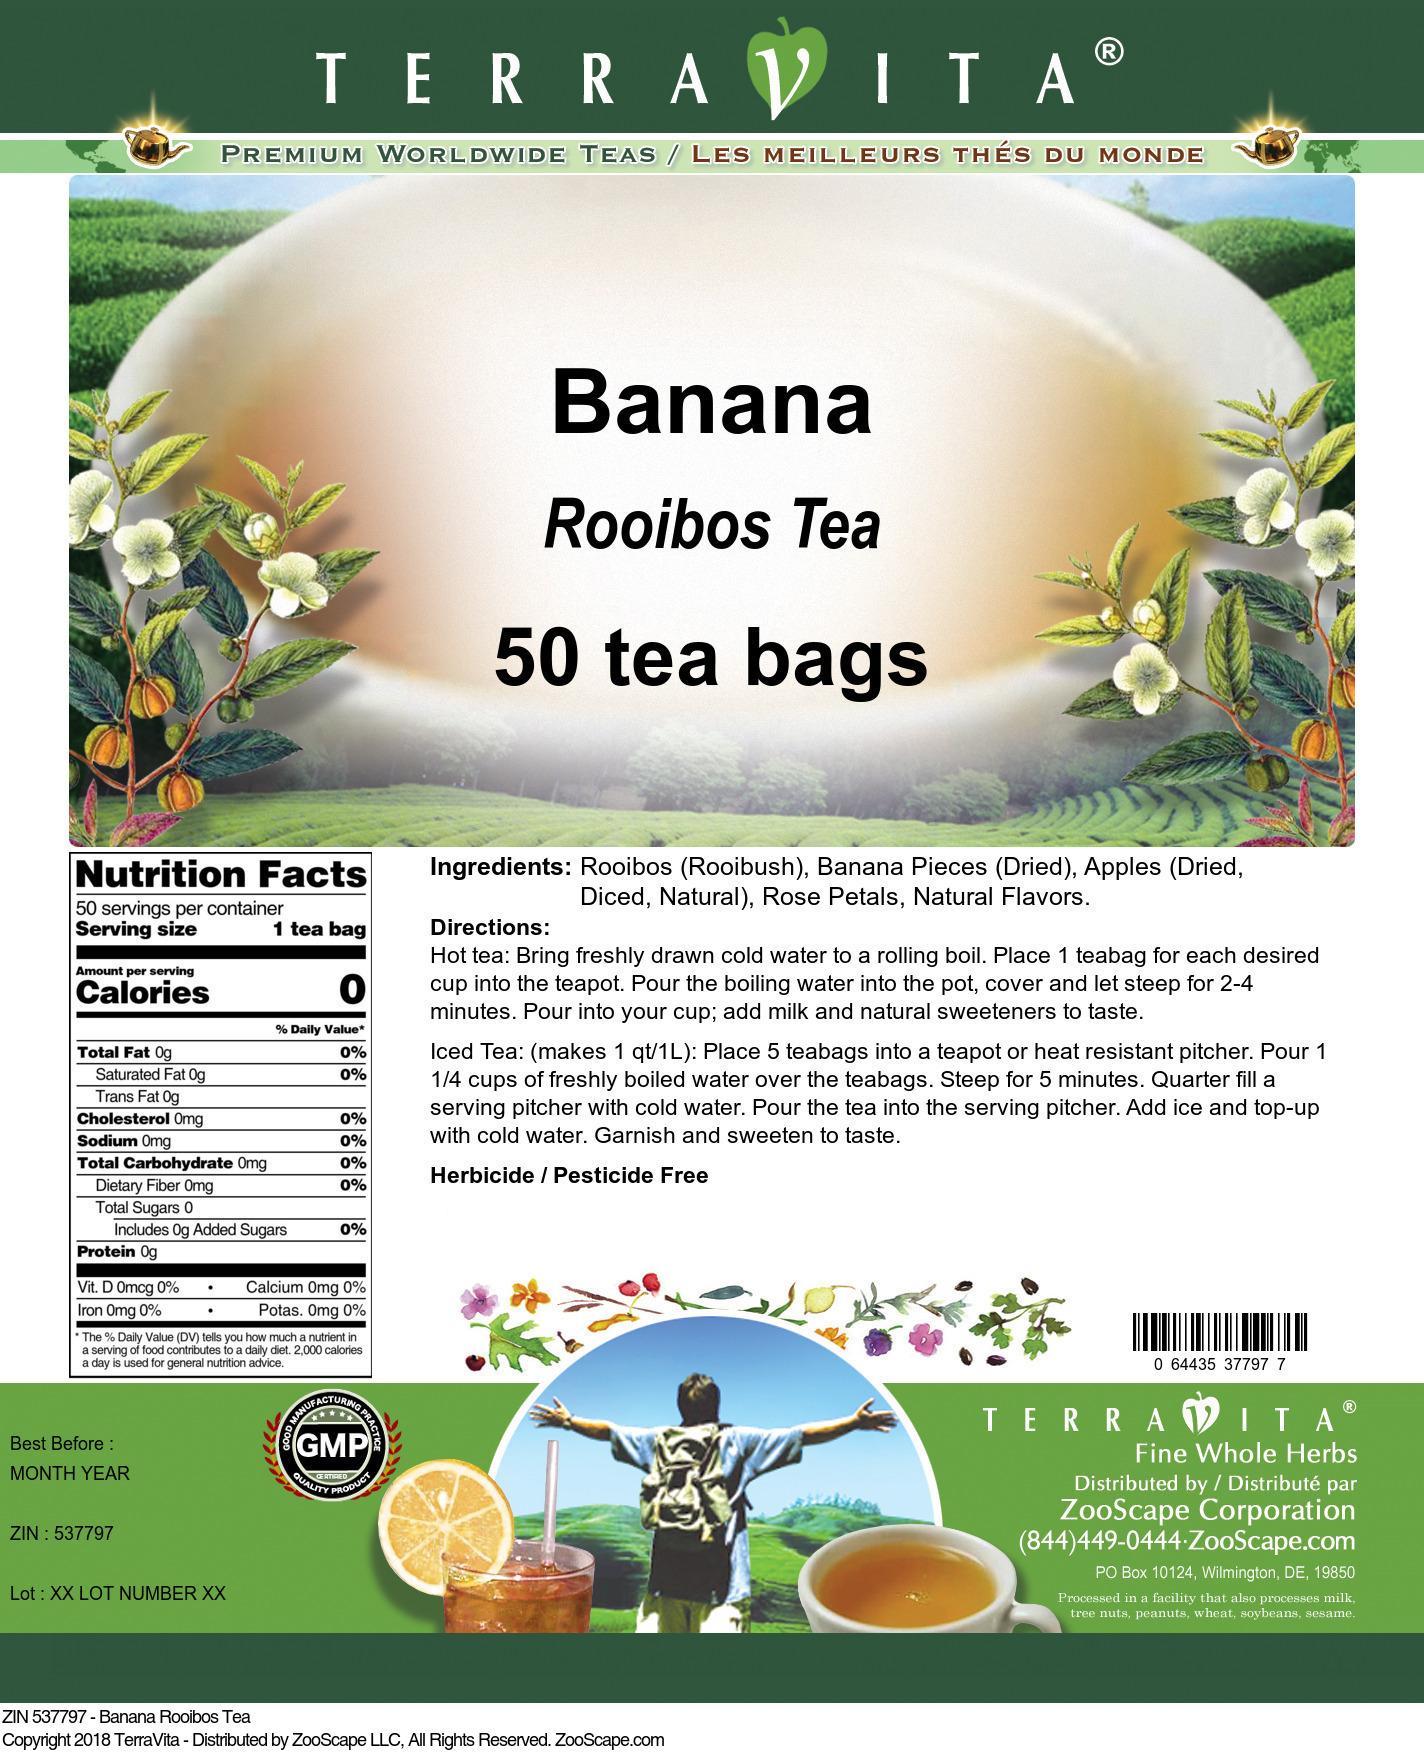 Banana Rooibos Tea